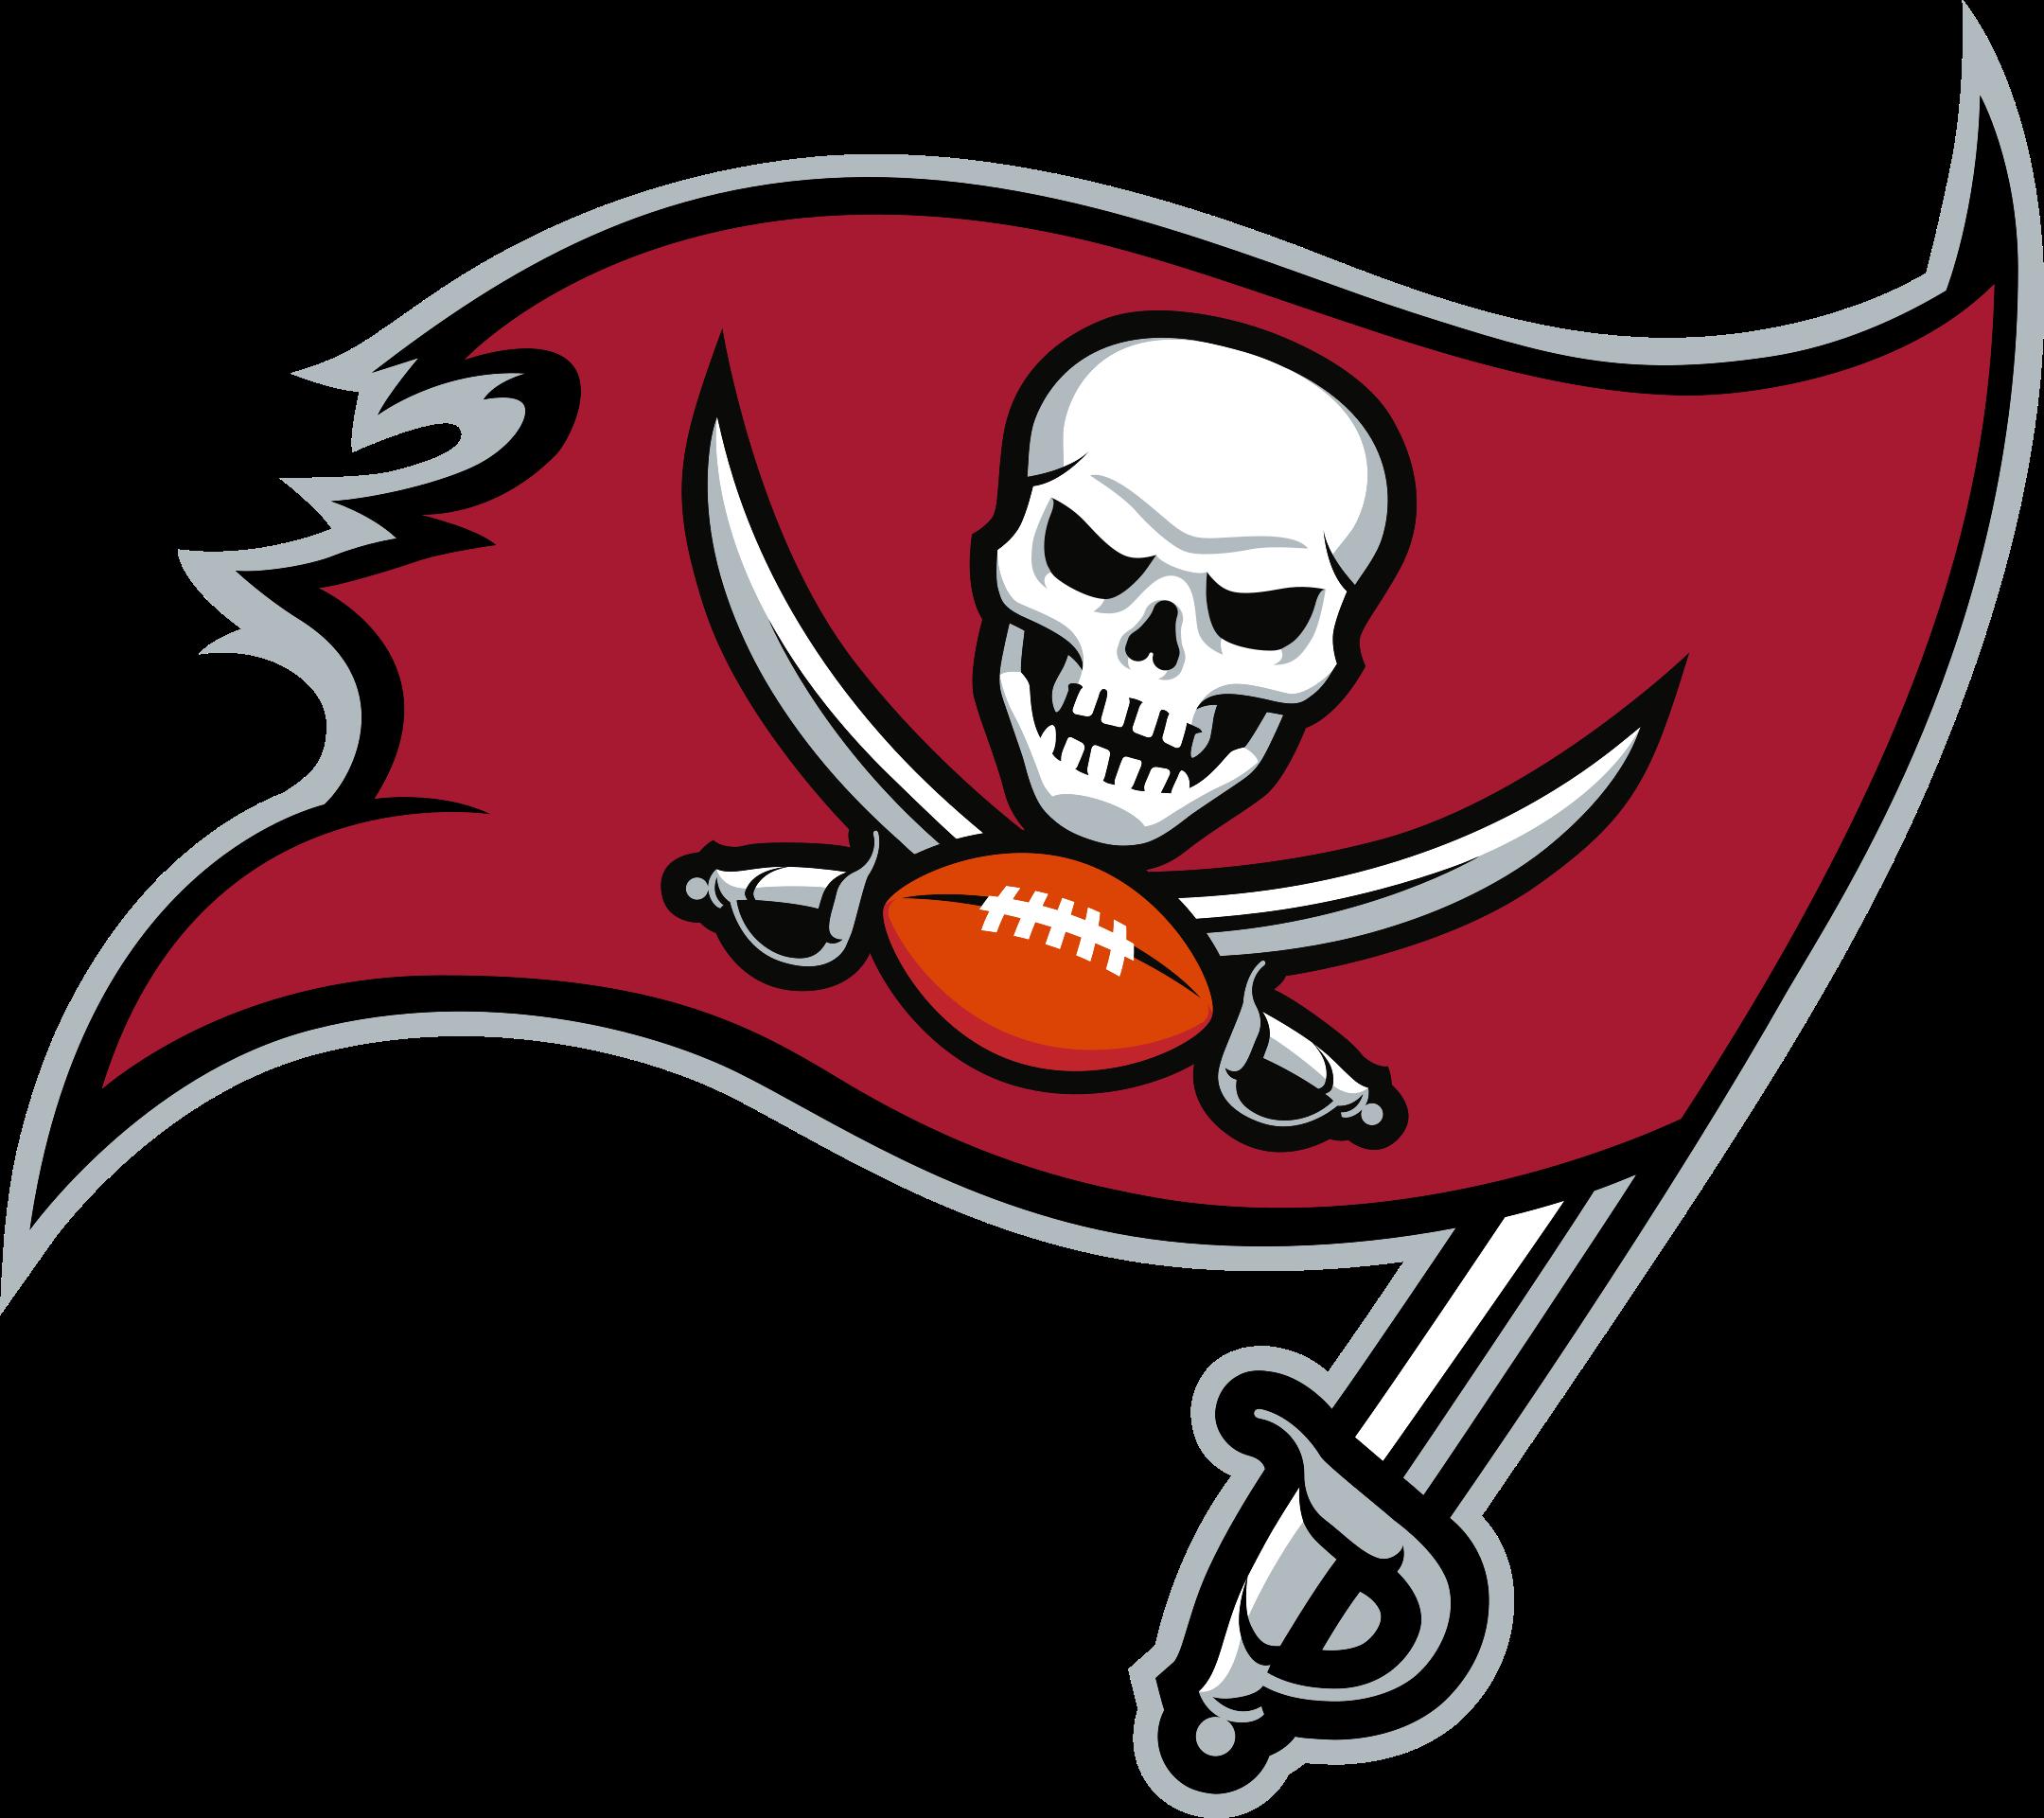 tampa bay buccaneers logo 1 - Tampa Bay Buccaneers Logo